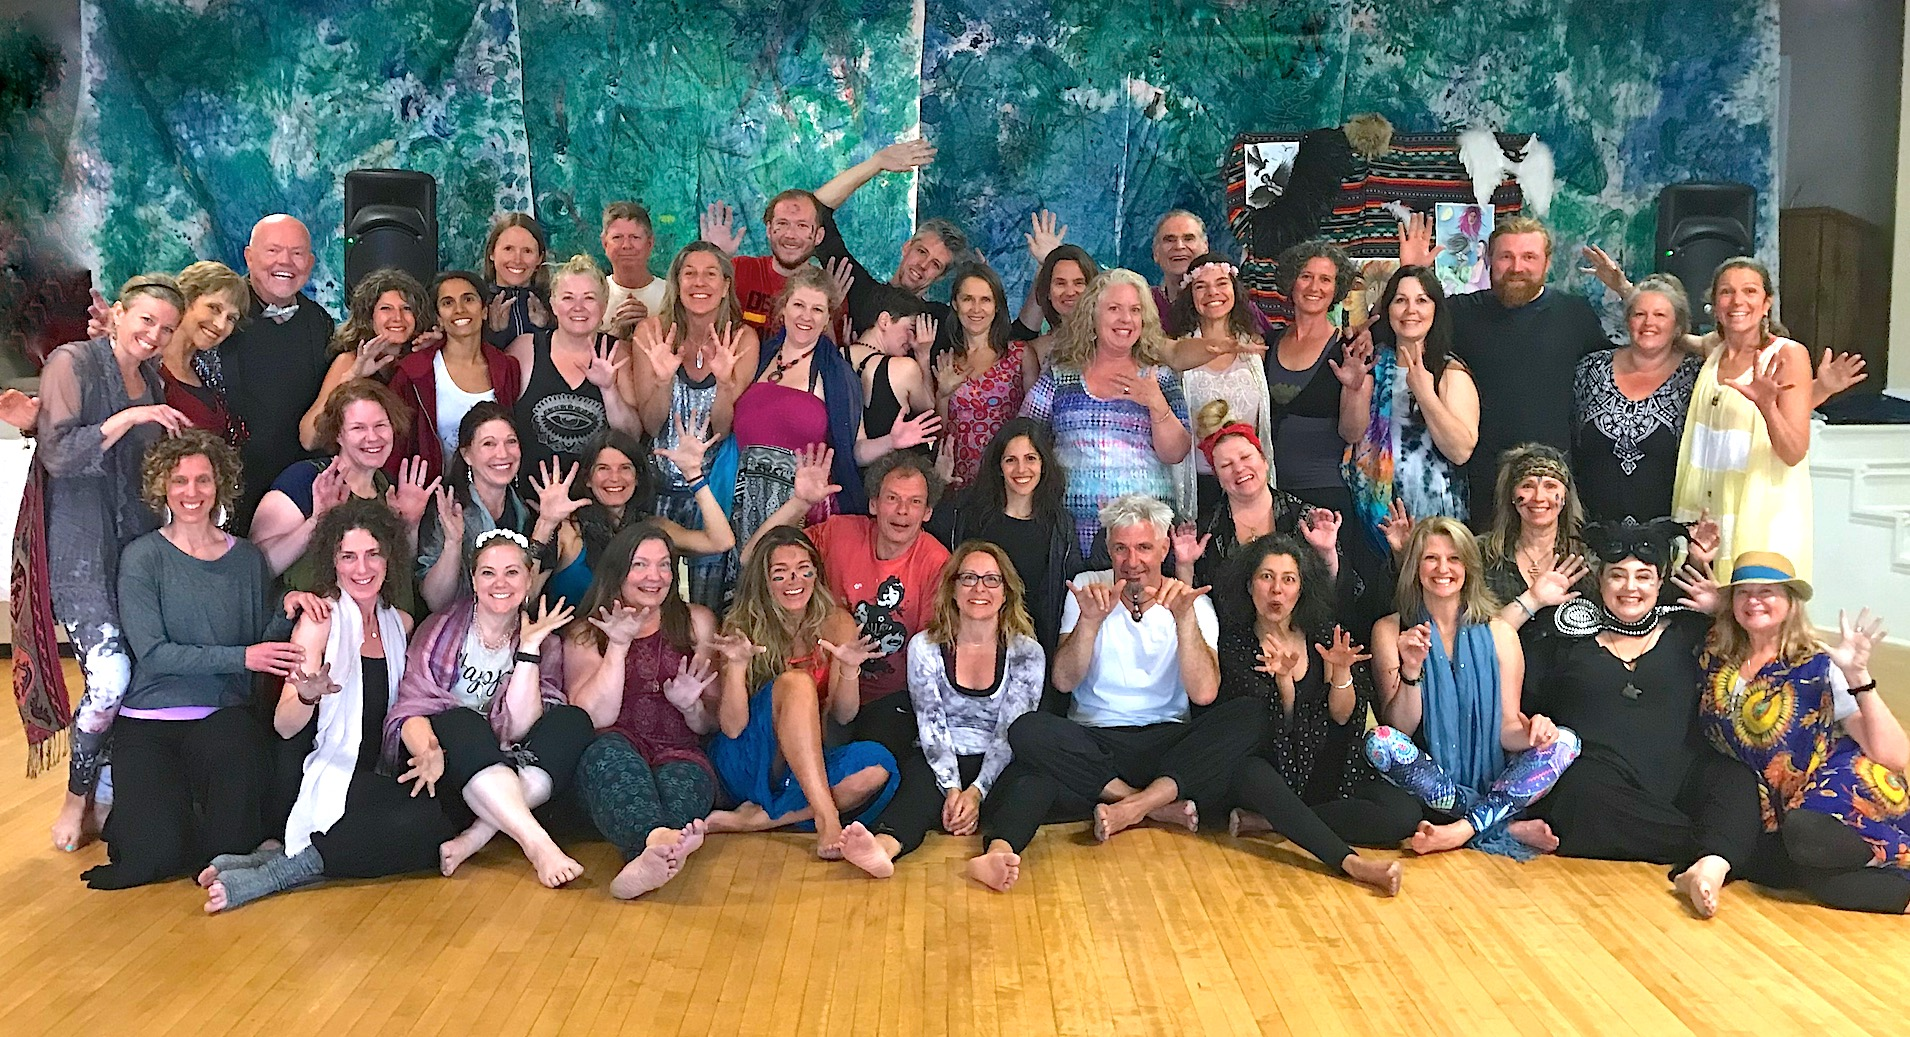 International group of dancing souls